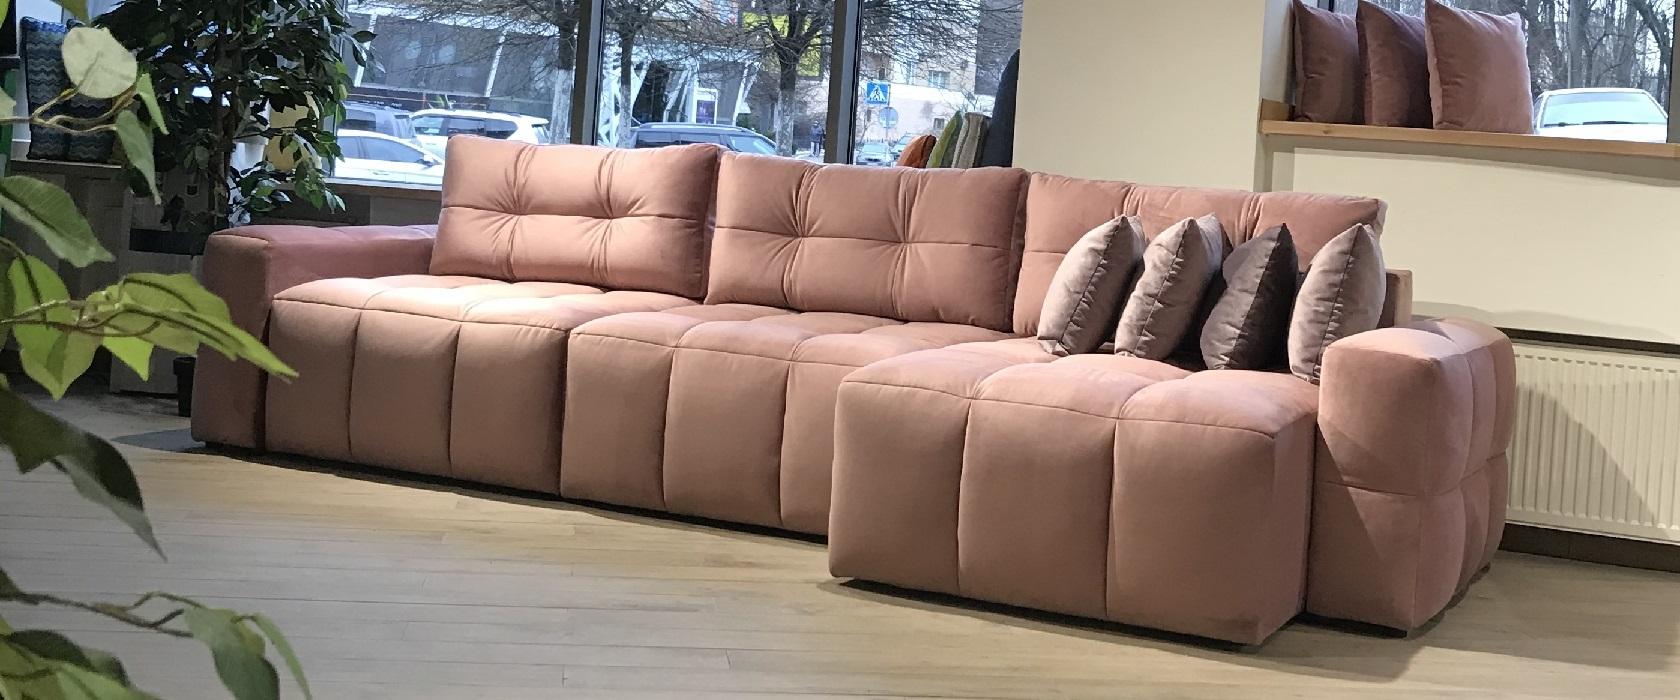 Кутовий диван Leonardo - Фото 2 - Pufetto